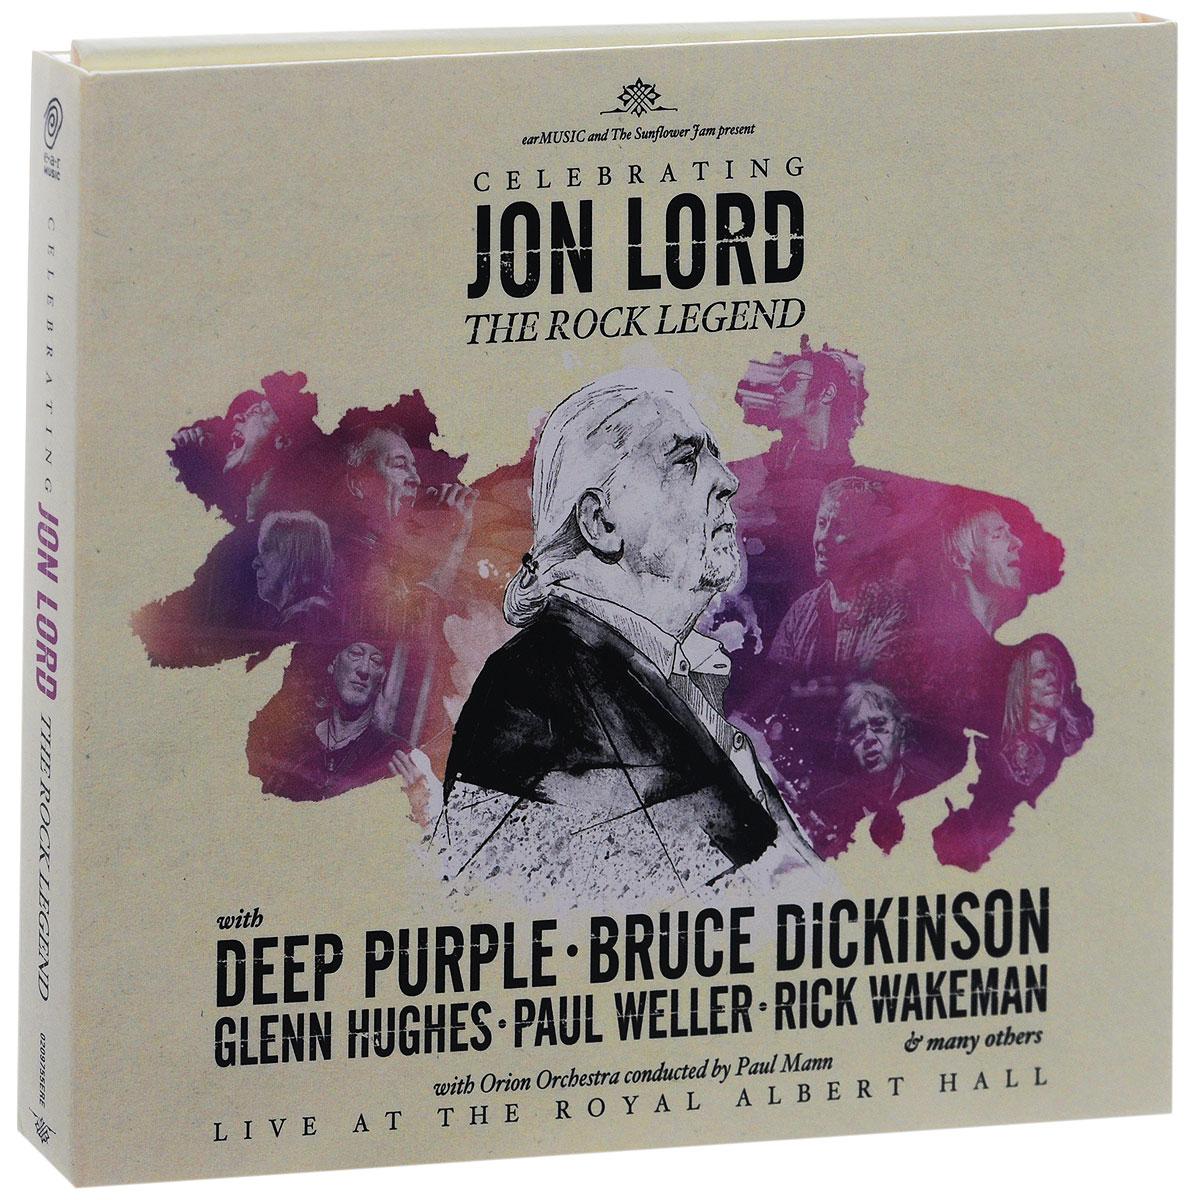 Джон Лорд,Deep Purple Jon Lord. Celebrating Jon Lord. The Rock Legend (2 CD) deep purple deep purple stormbringer 35th anniversary edition cd dvd